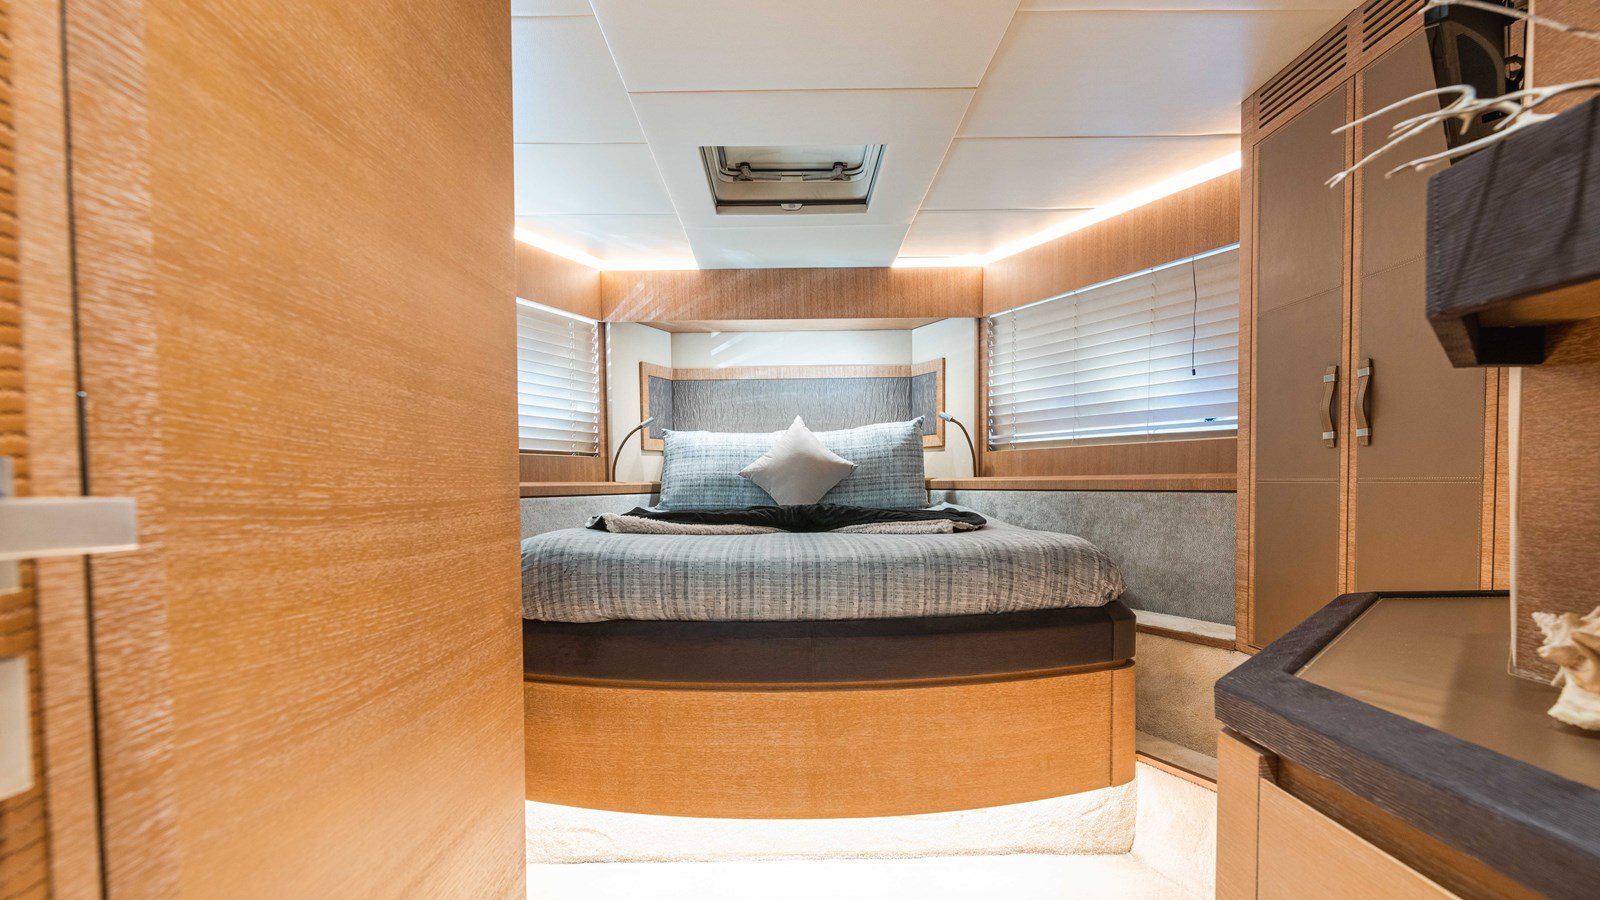 76 Monte Carlo (43 of 127) 2014 MONTE CARLO YACHTS Motoryacht Motor Yacht 2825205